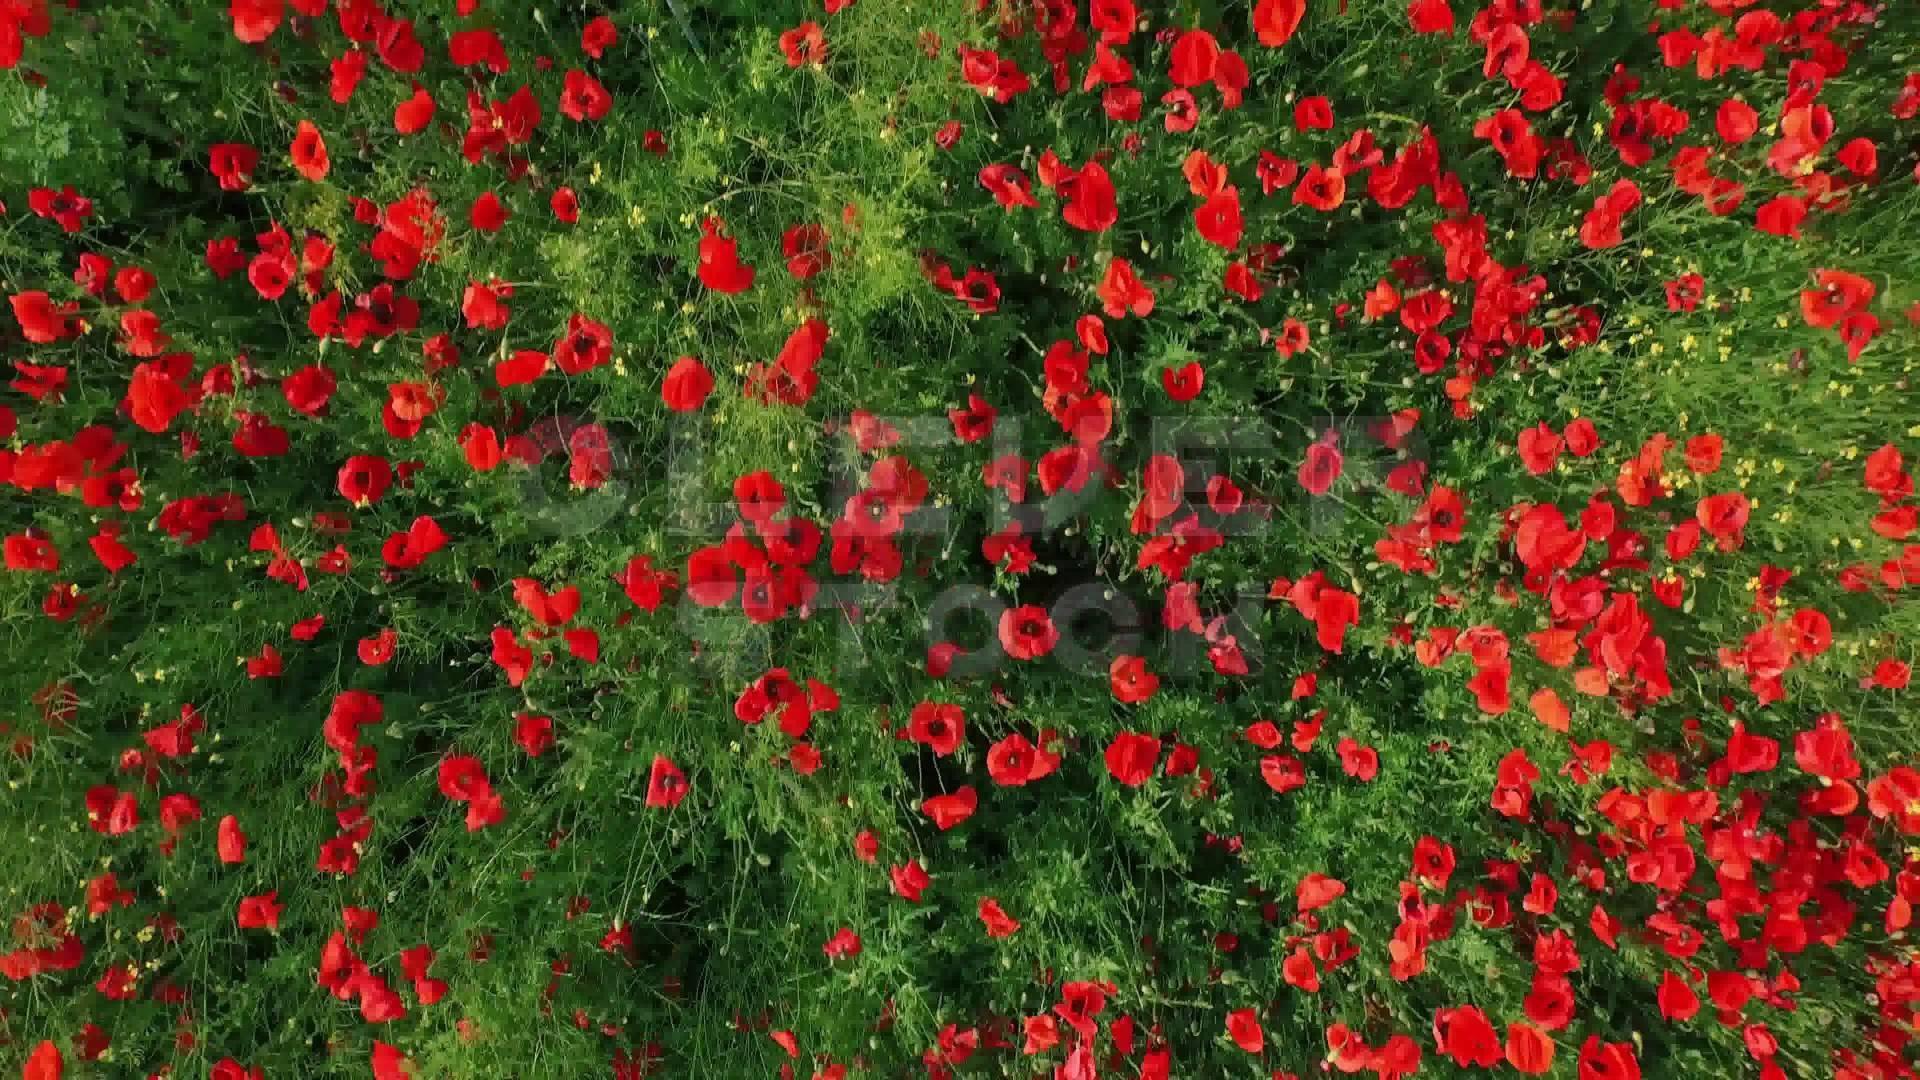 Freddy Krueger Wallpaper 3d Vintage Flower Background 183 ① Download Free Amazing High